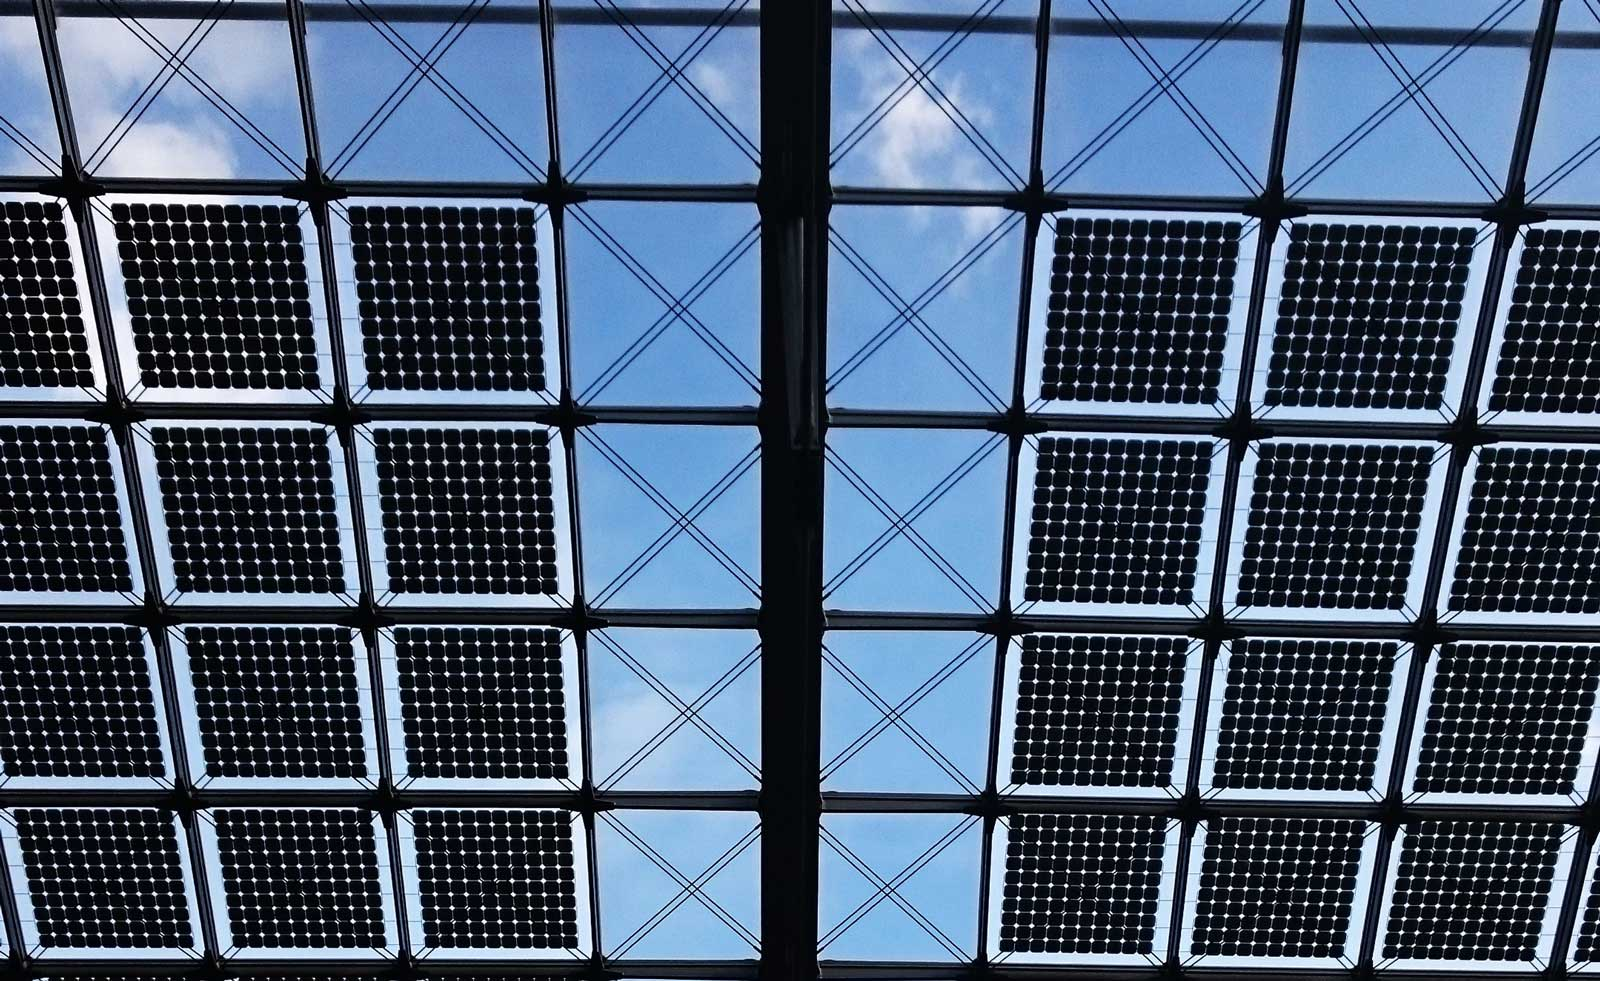 intec cristales fotovoltaicos